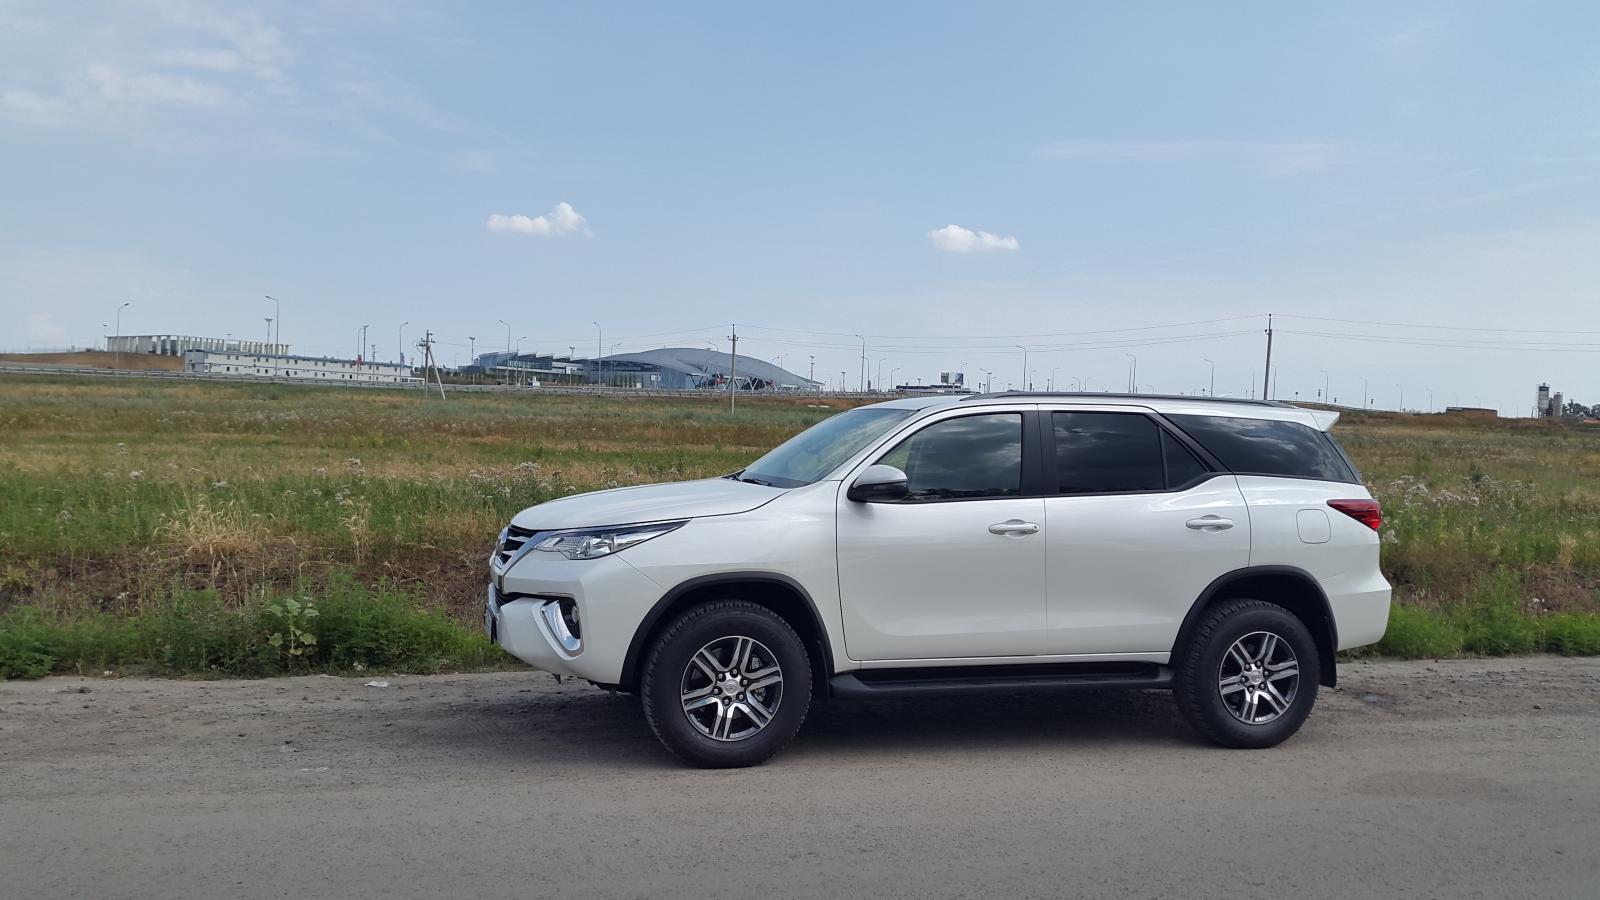 20180714 Toyota Fortuner 2.7 бензин